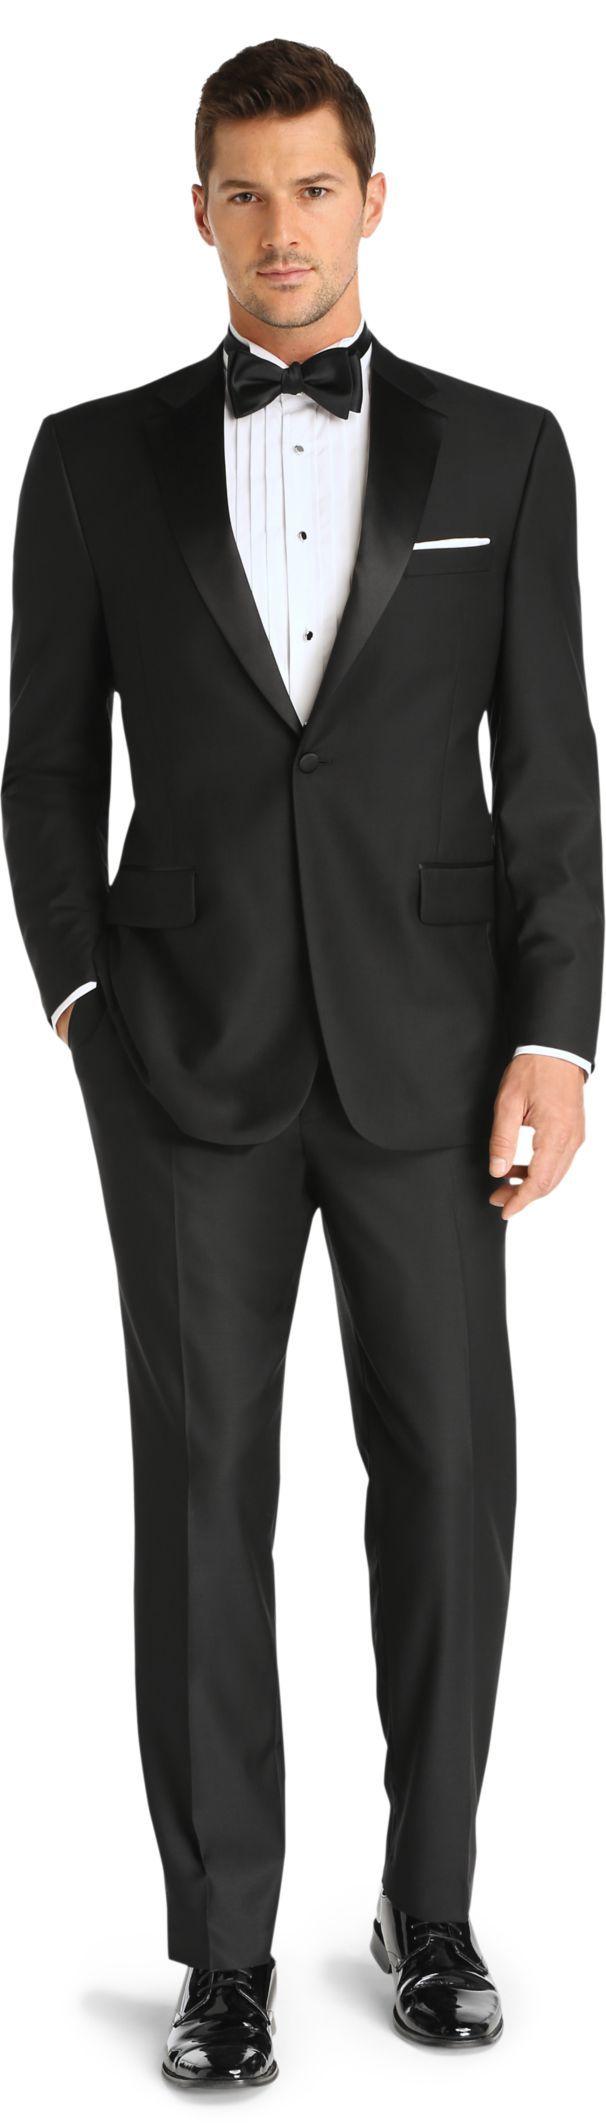 Signature Notch Lapel Tuxedo with Plain Front Trousers